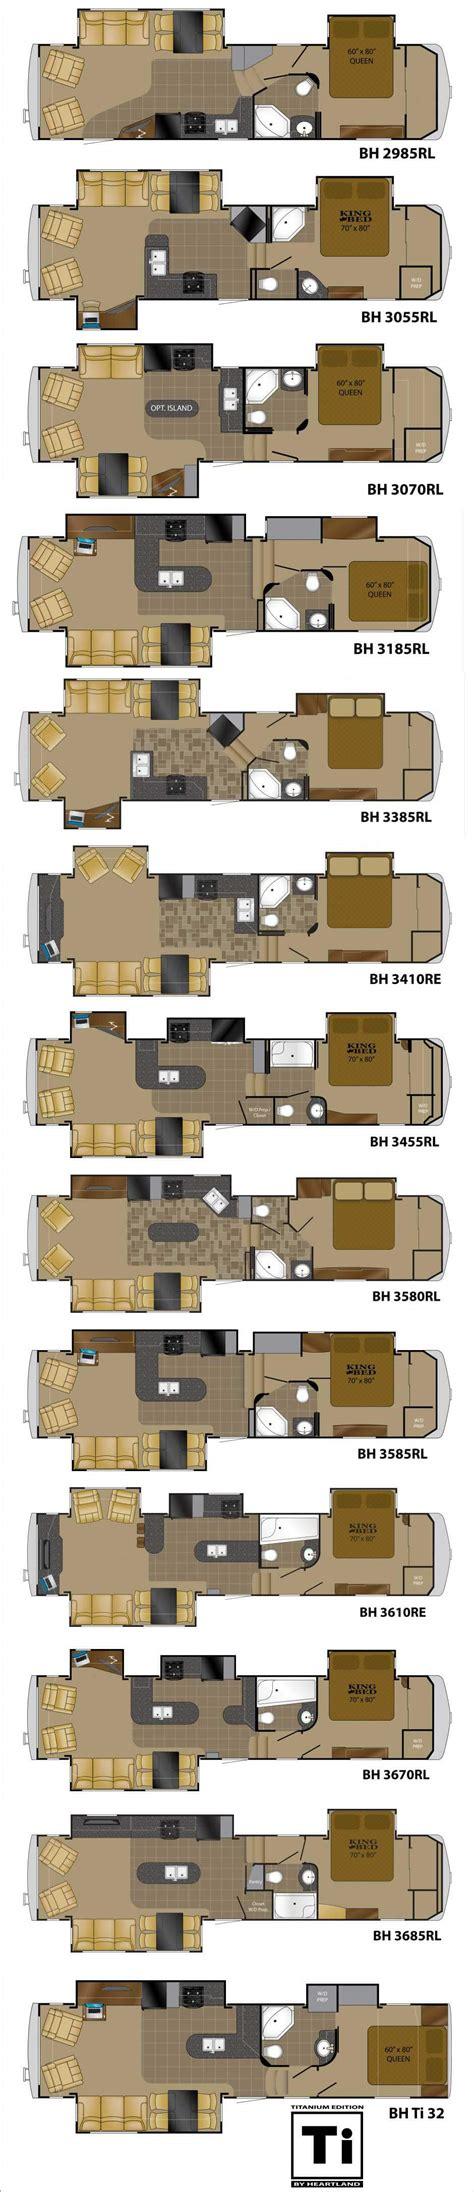 bighorn fifth wheel floor plans 2012 heartland bighorn fifth wheel roaming times